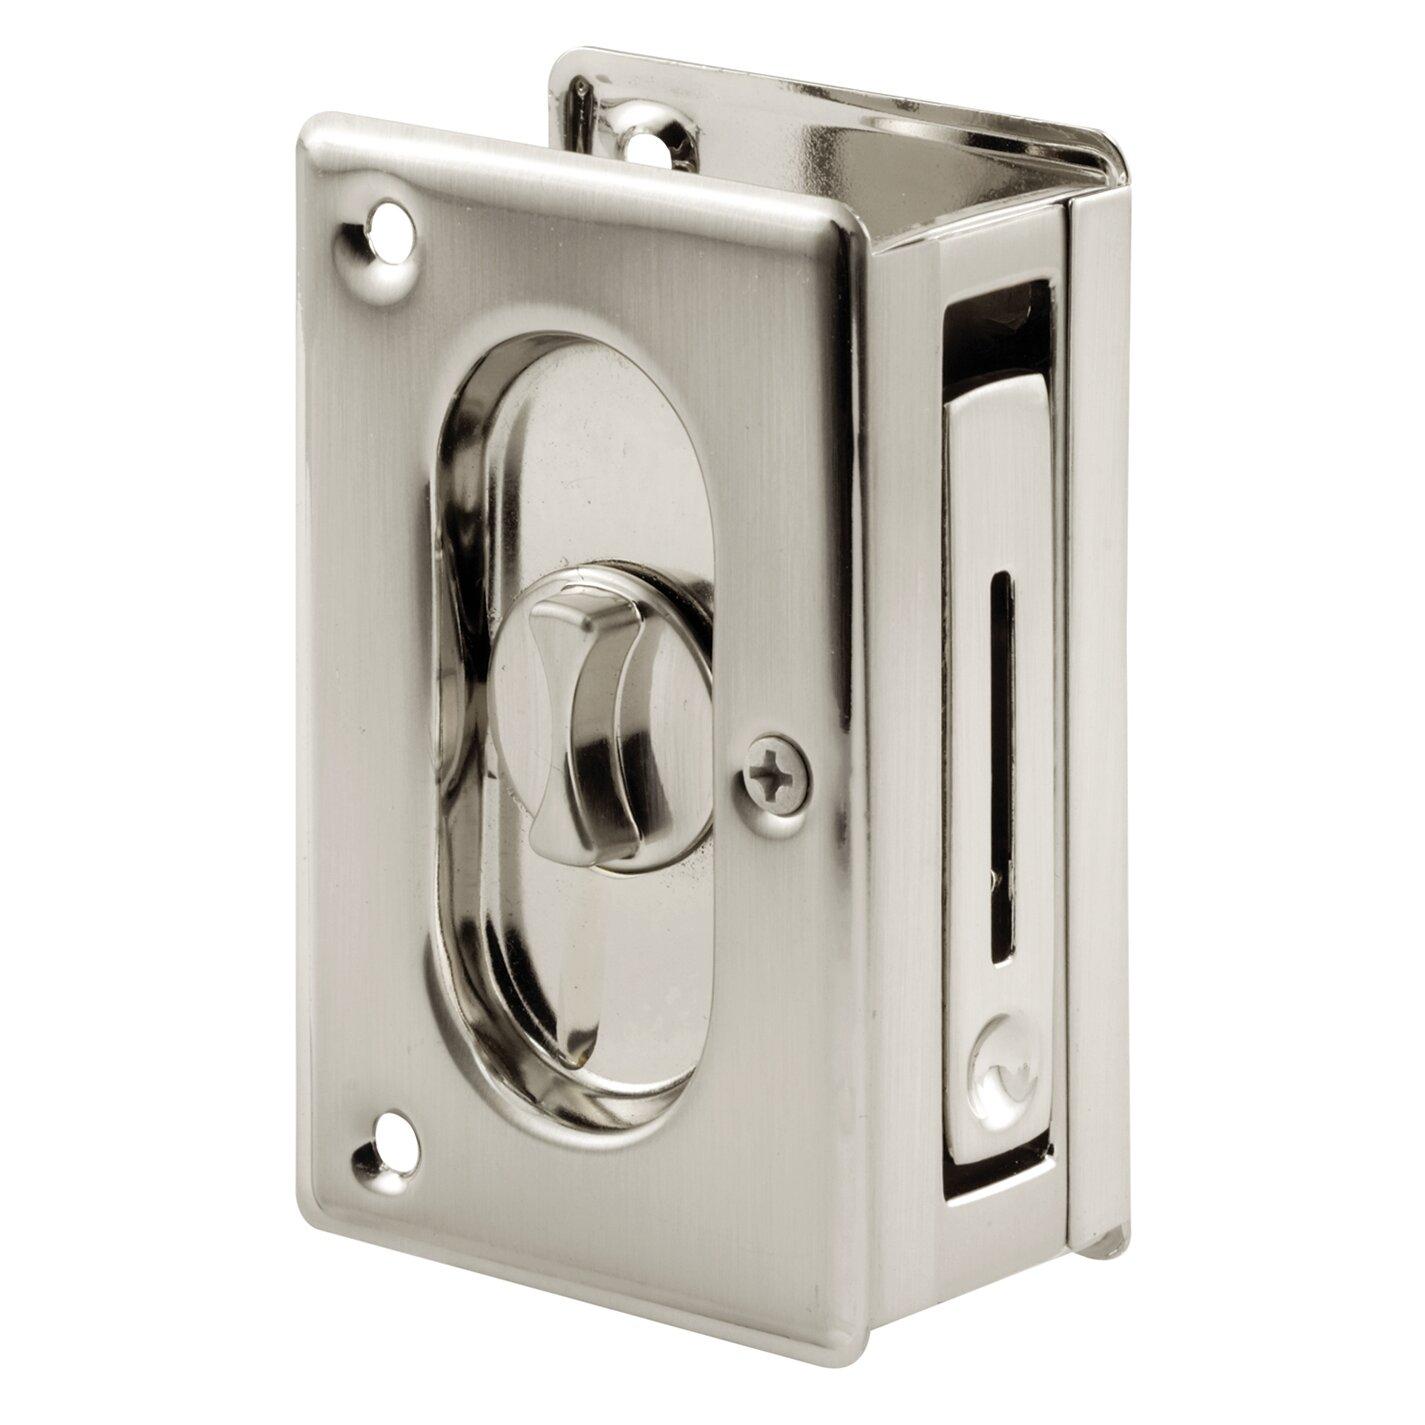 Primeline Privacy Lock With Pull Pocket Door Hardware Wayfair